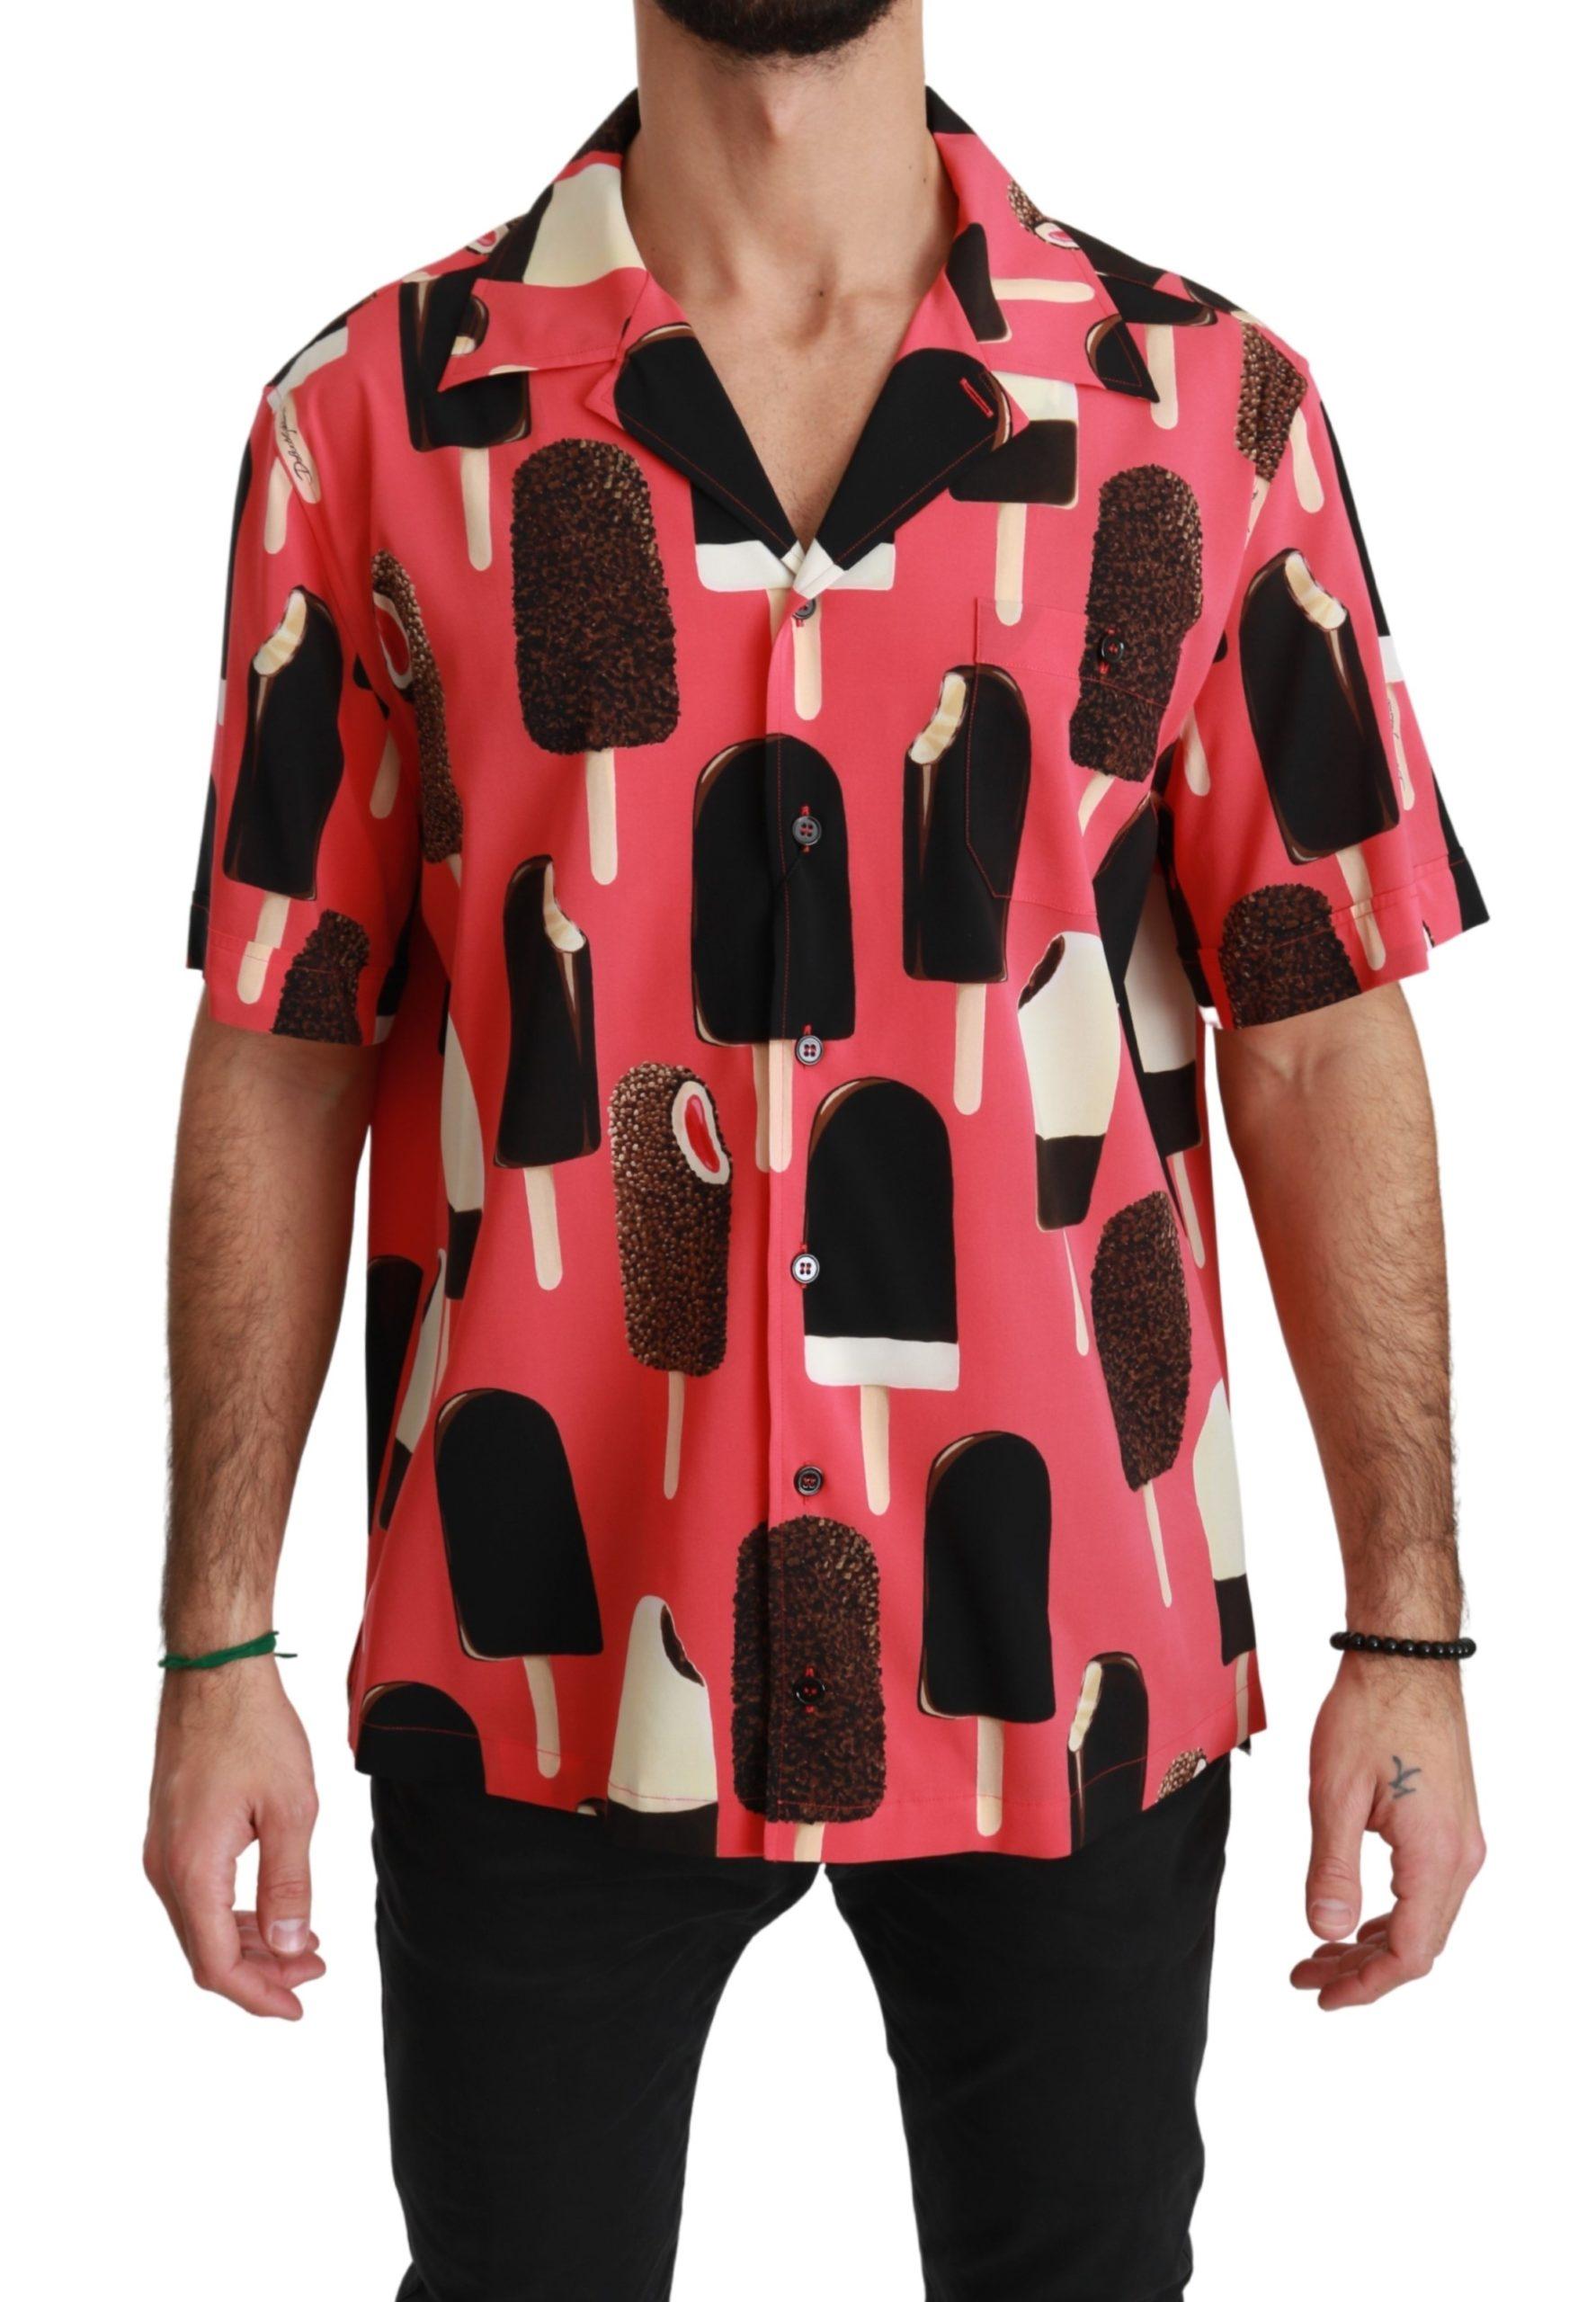 Dolce & Gabbana Men's Ice Cream Print Casual Shirt Pink TSH4465 - 44 | 3XL